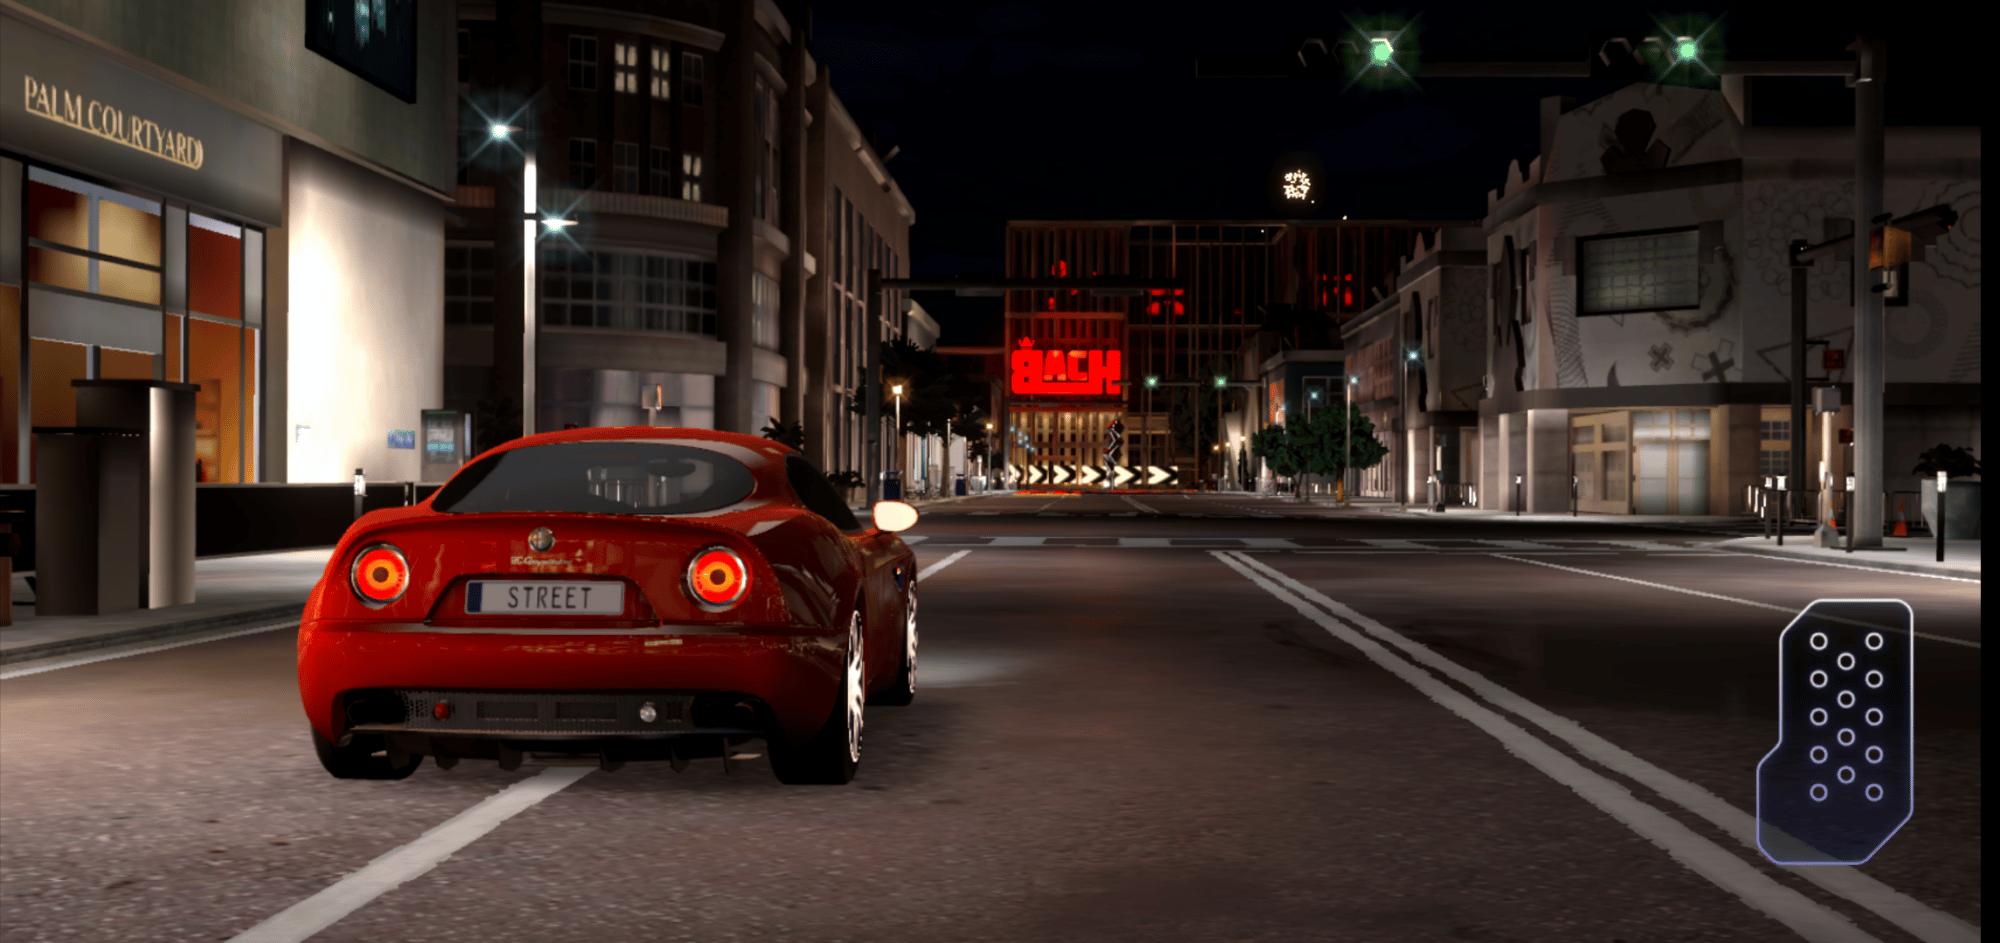 Aperçu Forza Street S20 FE 5G